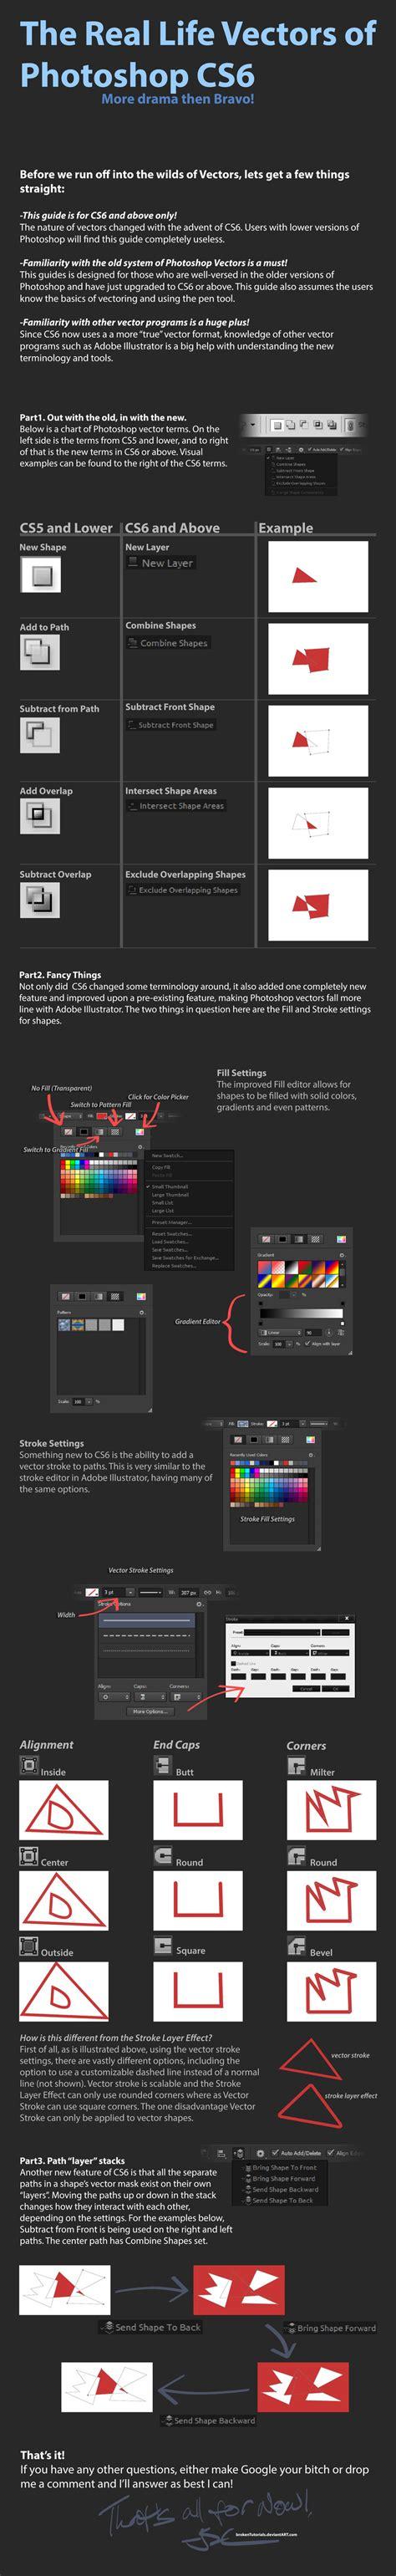 tutorial photoshop cs6 vector photoshop cs6 vector guide by jrcnrd on deviantart